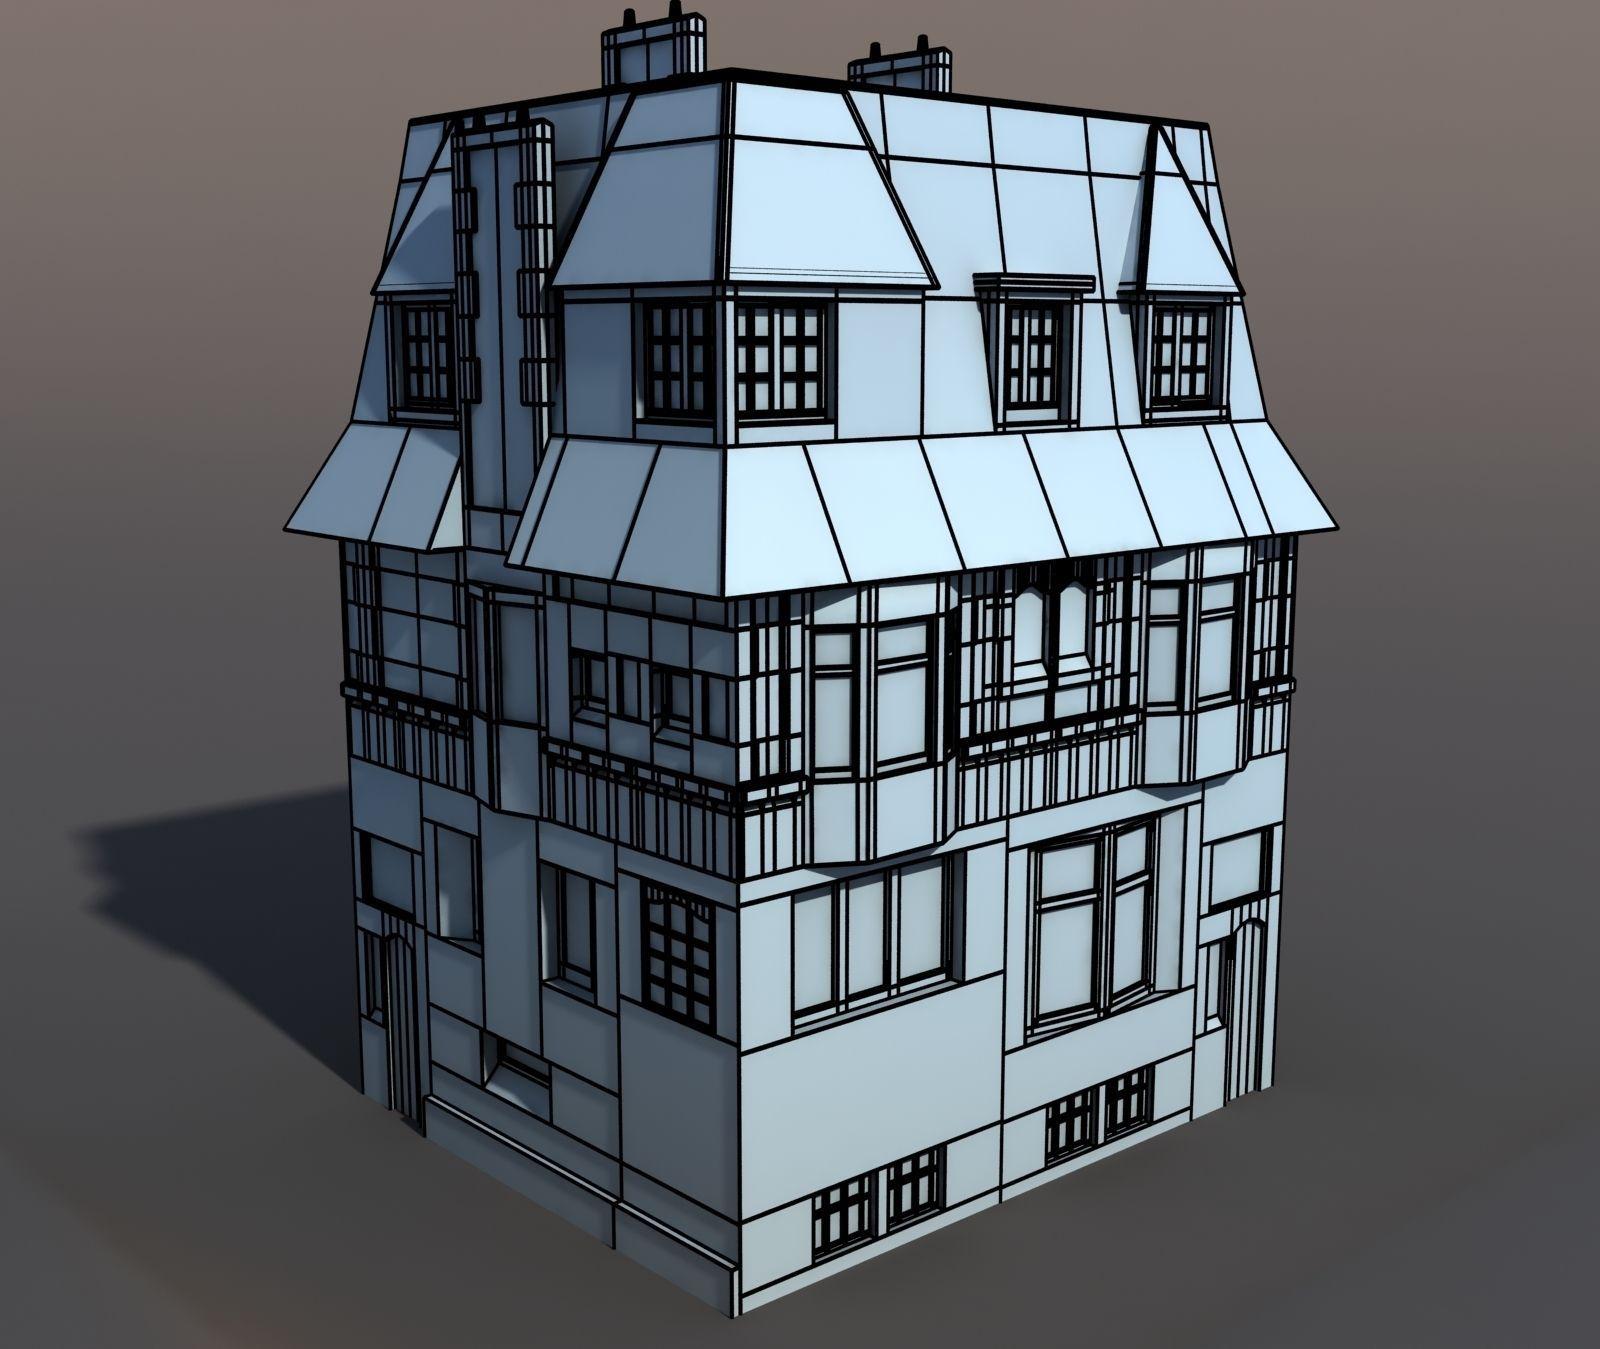 Model Apartments: 3D Model Apartment House 44 VR / AR / Low-poly MAX OBJ 3DS